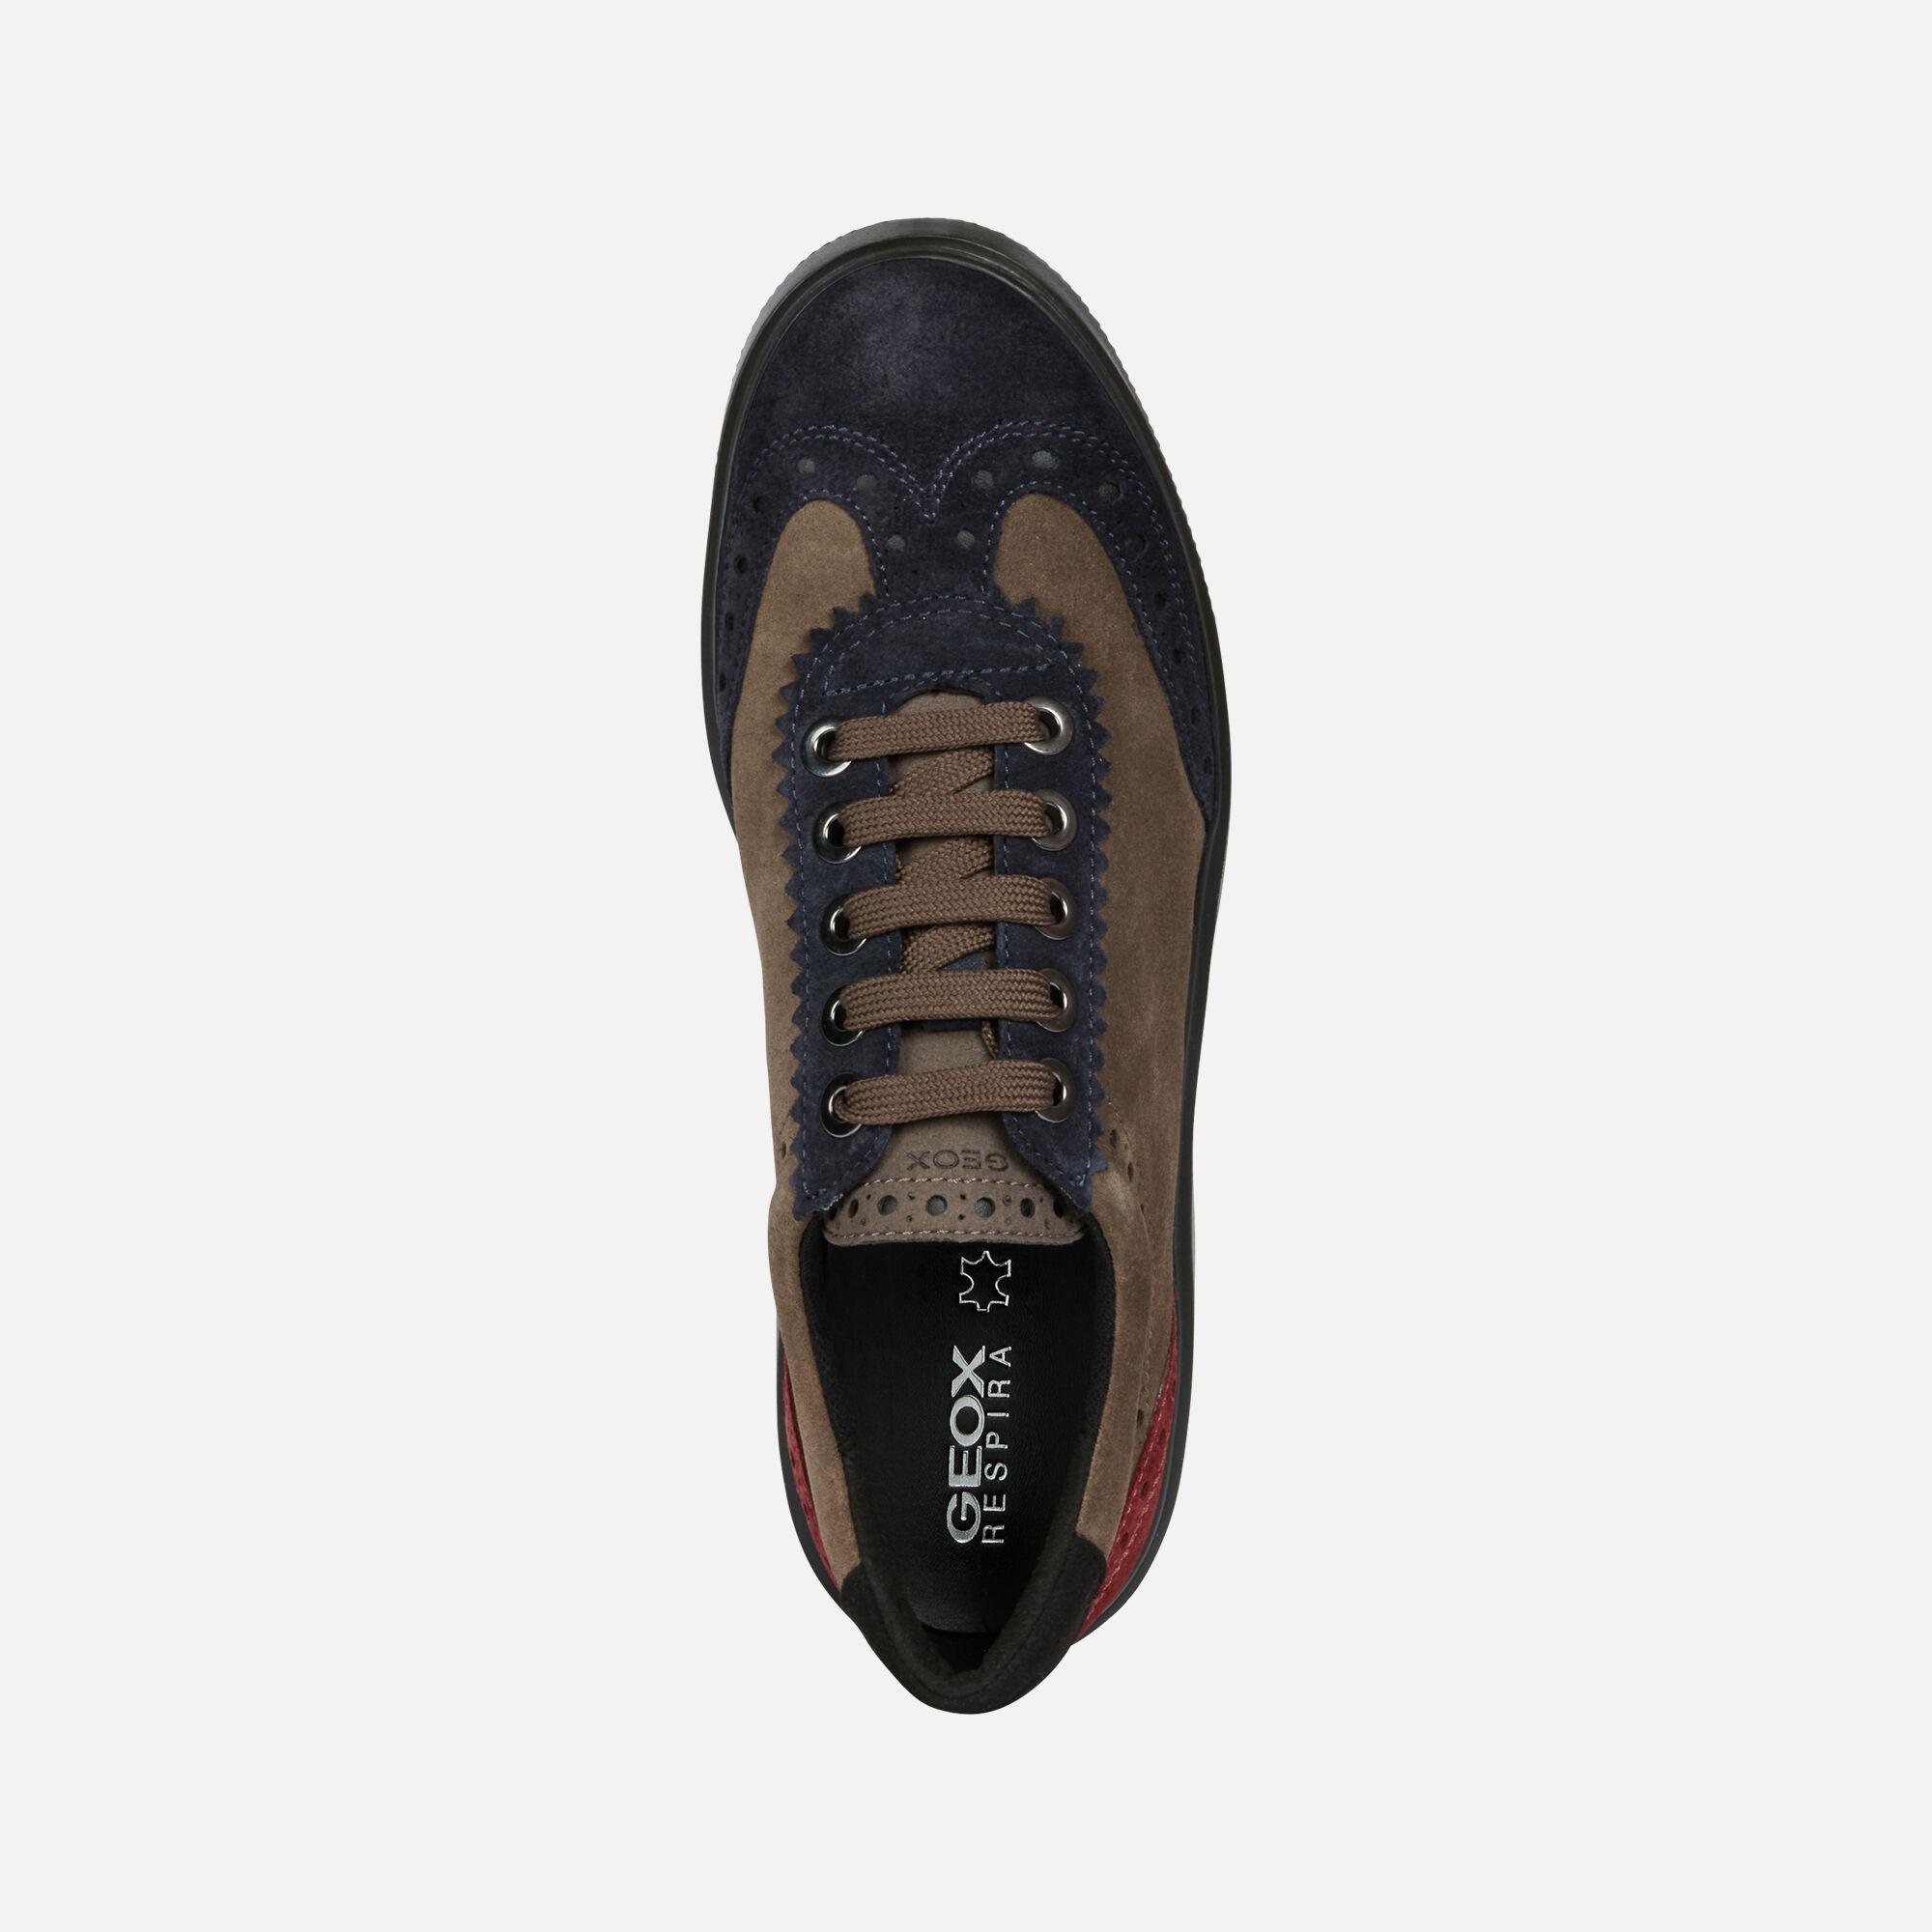 Geox KAULA Woman Brown Sneakers   Geox